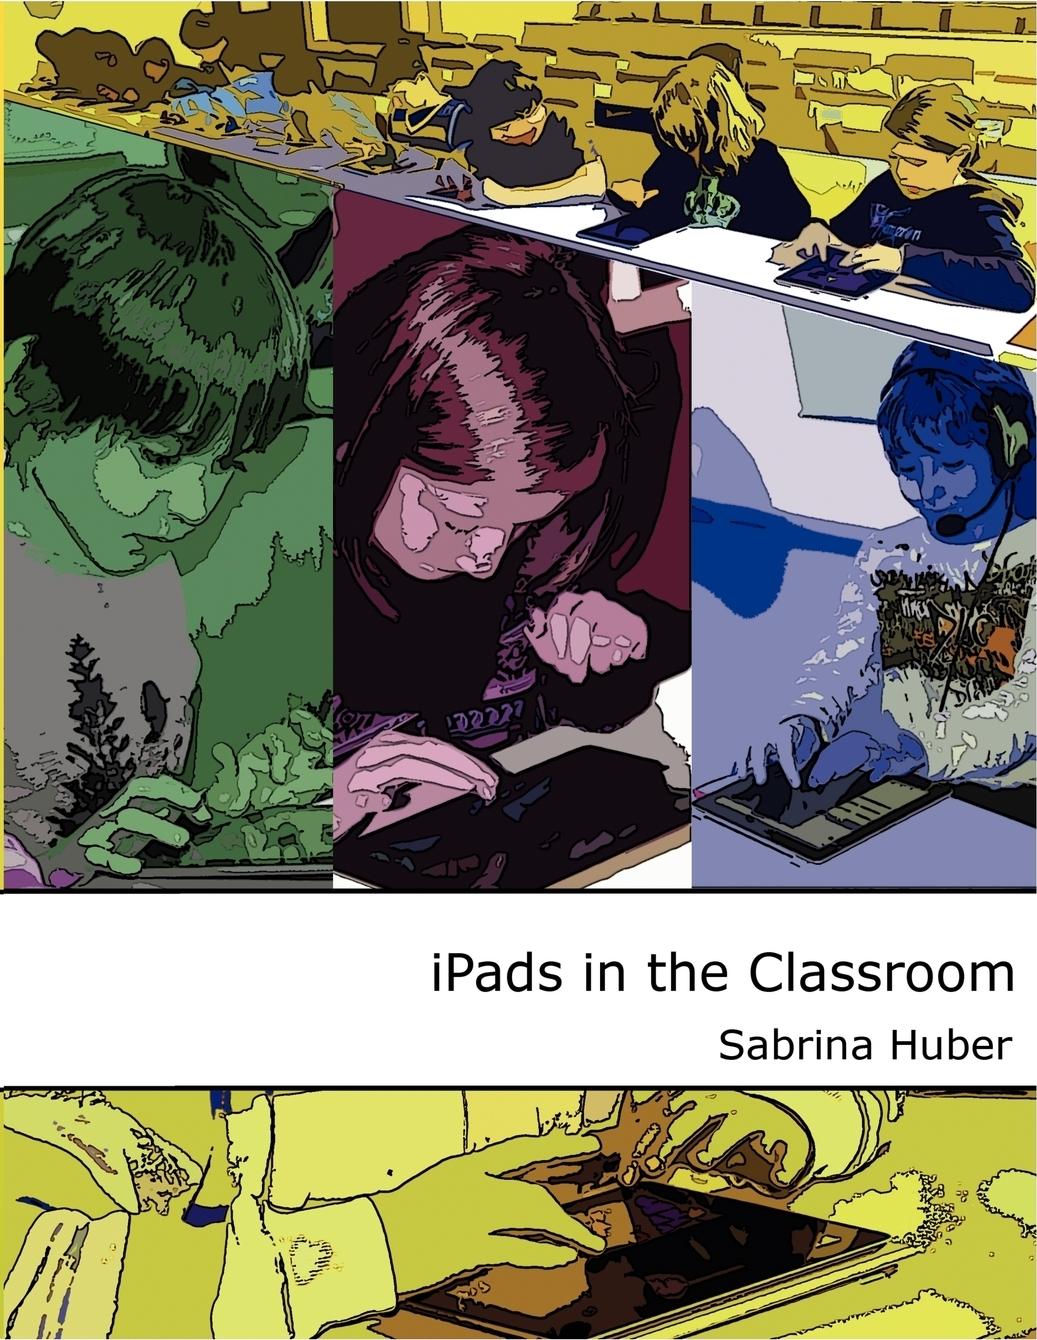 Sabrina Huber. iPads in the Classroom